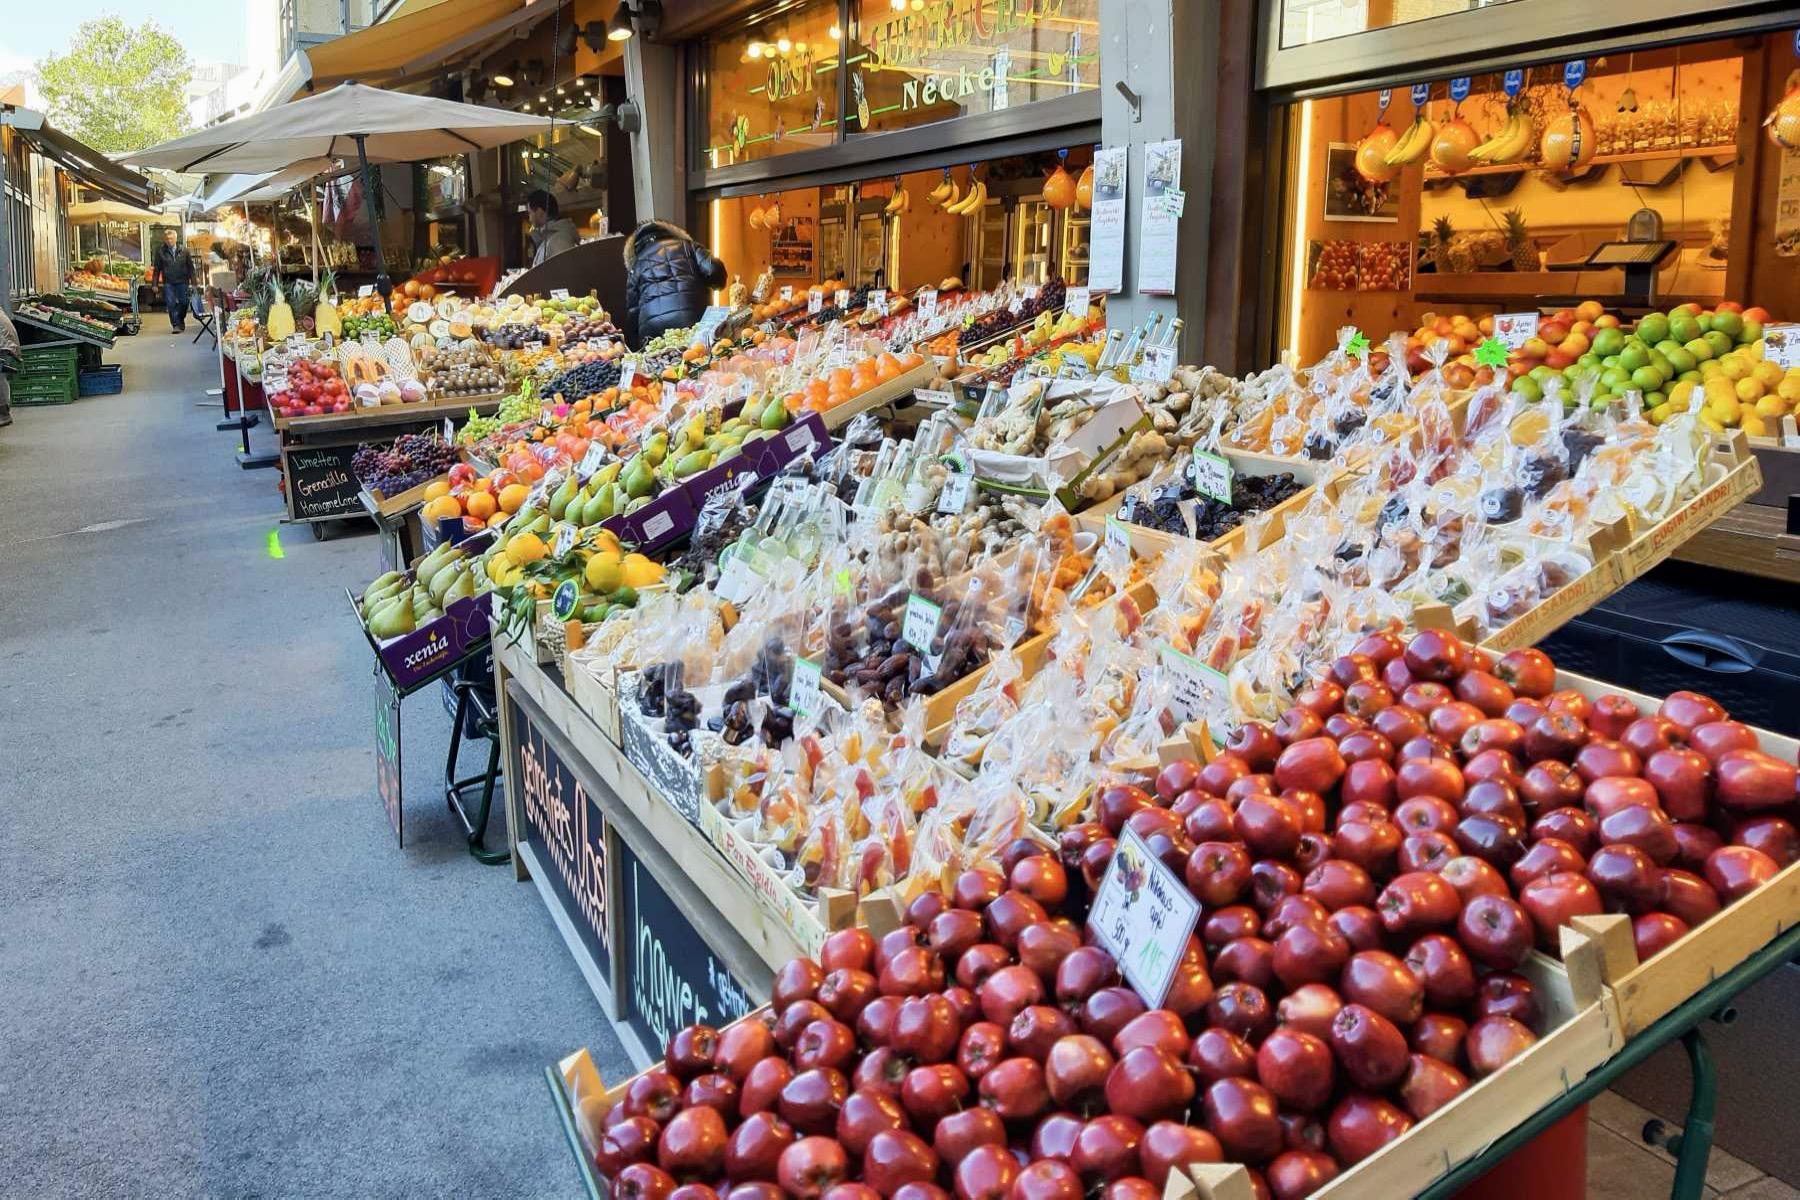 geheimtipp Augsburg Stadtmarkt – ©Blanka Gano